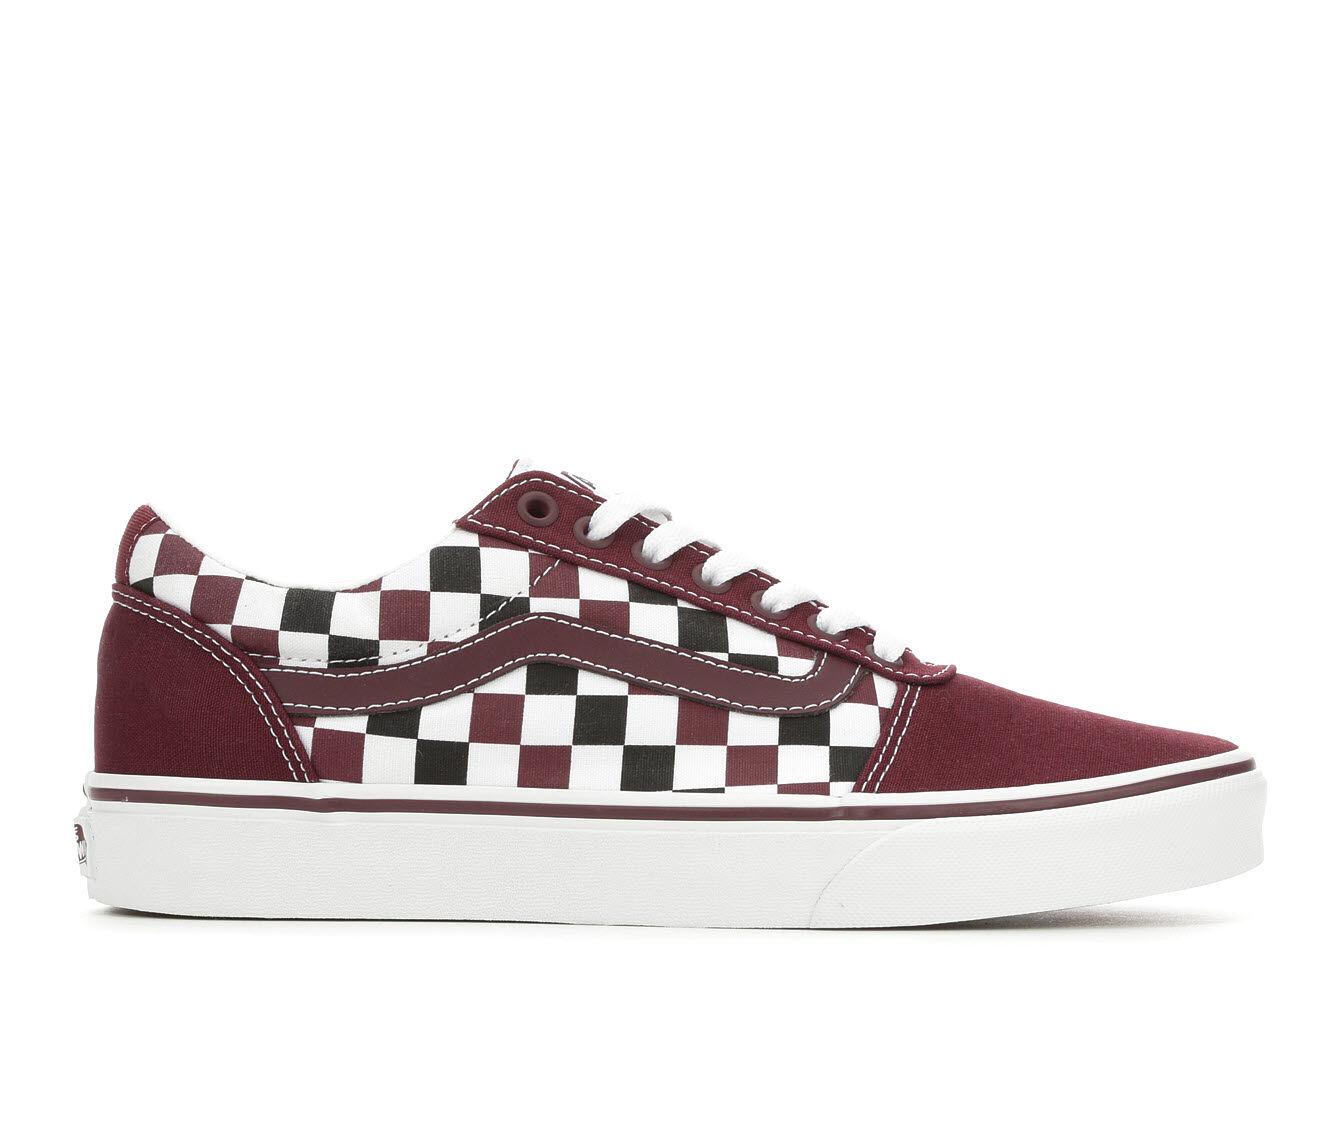 Men's Vans Ward Skate Shoes Bur/Bk/Wh Chkbd